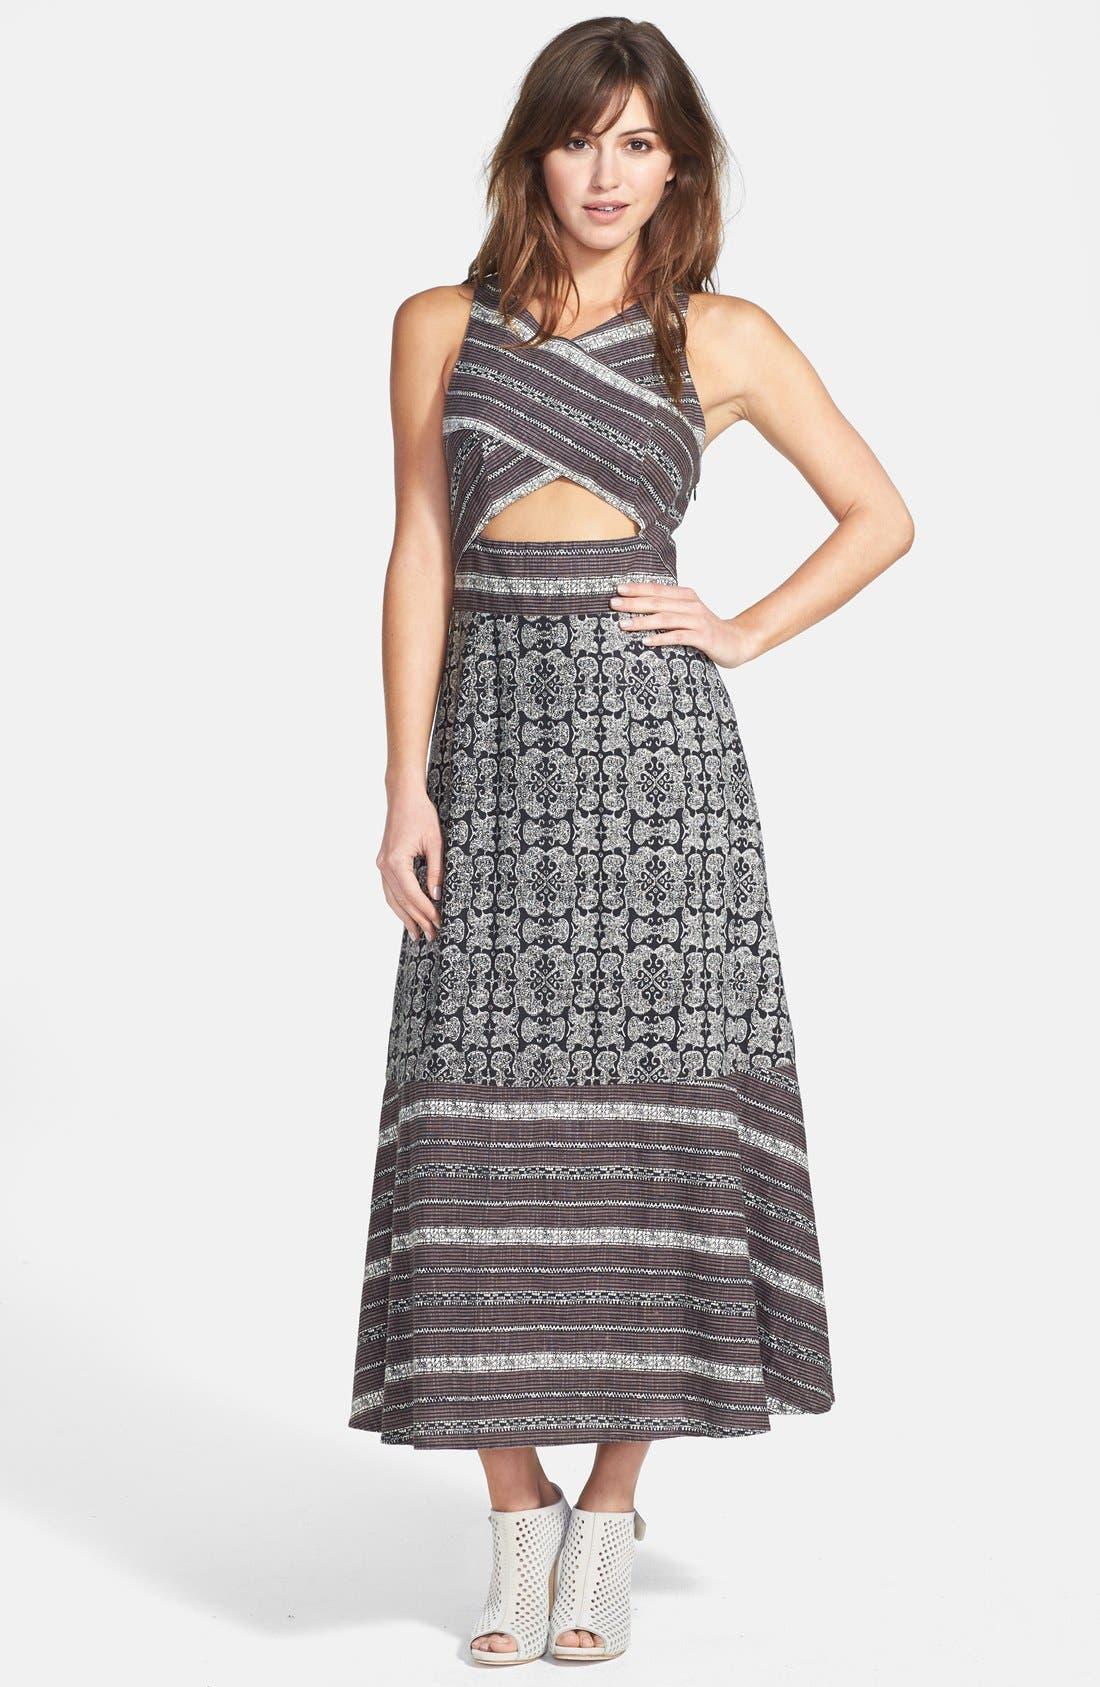 Main Image - Free People 'Tribal Tale' Cutout Mixed Print Midi Dress